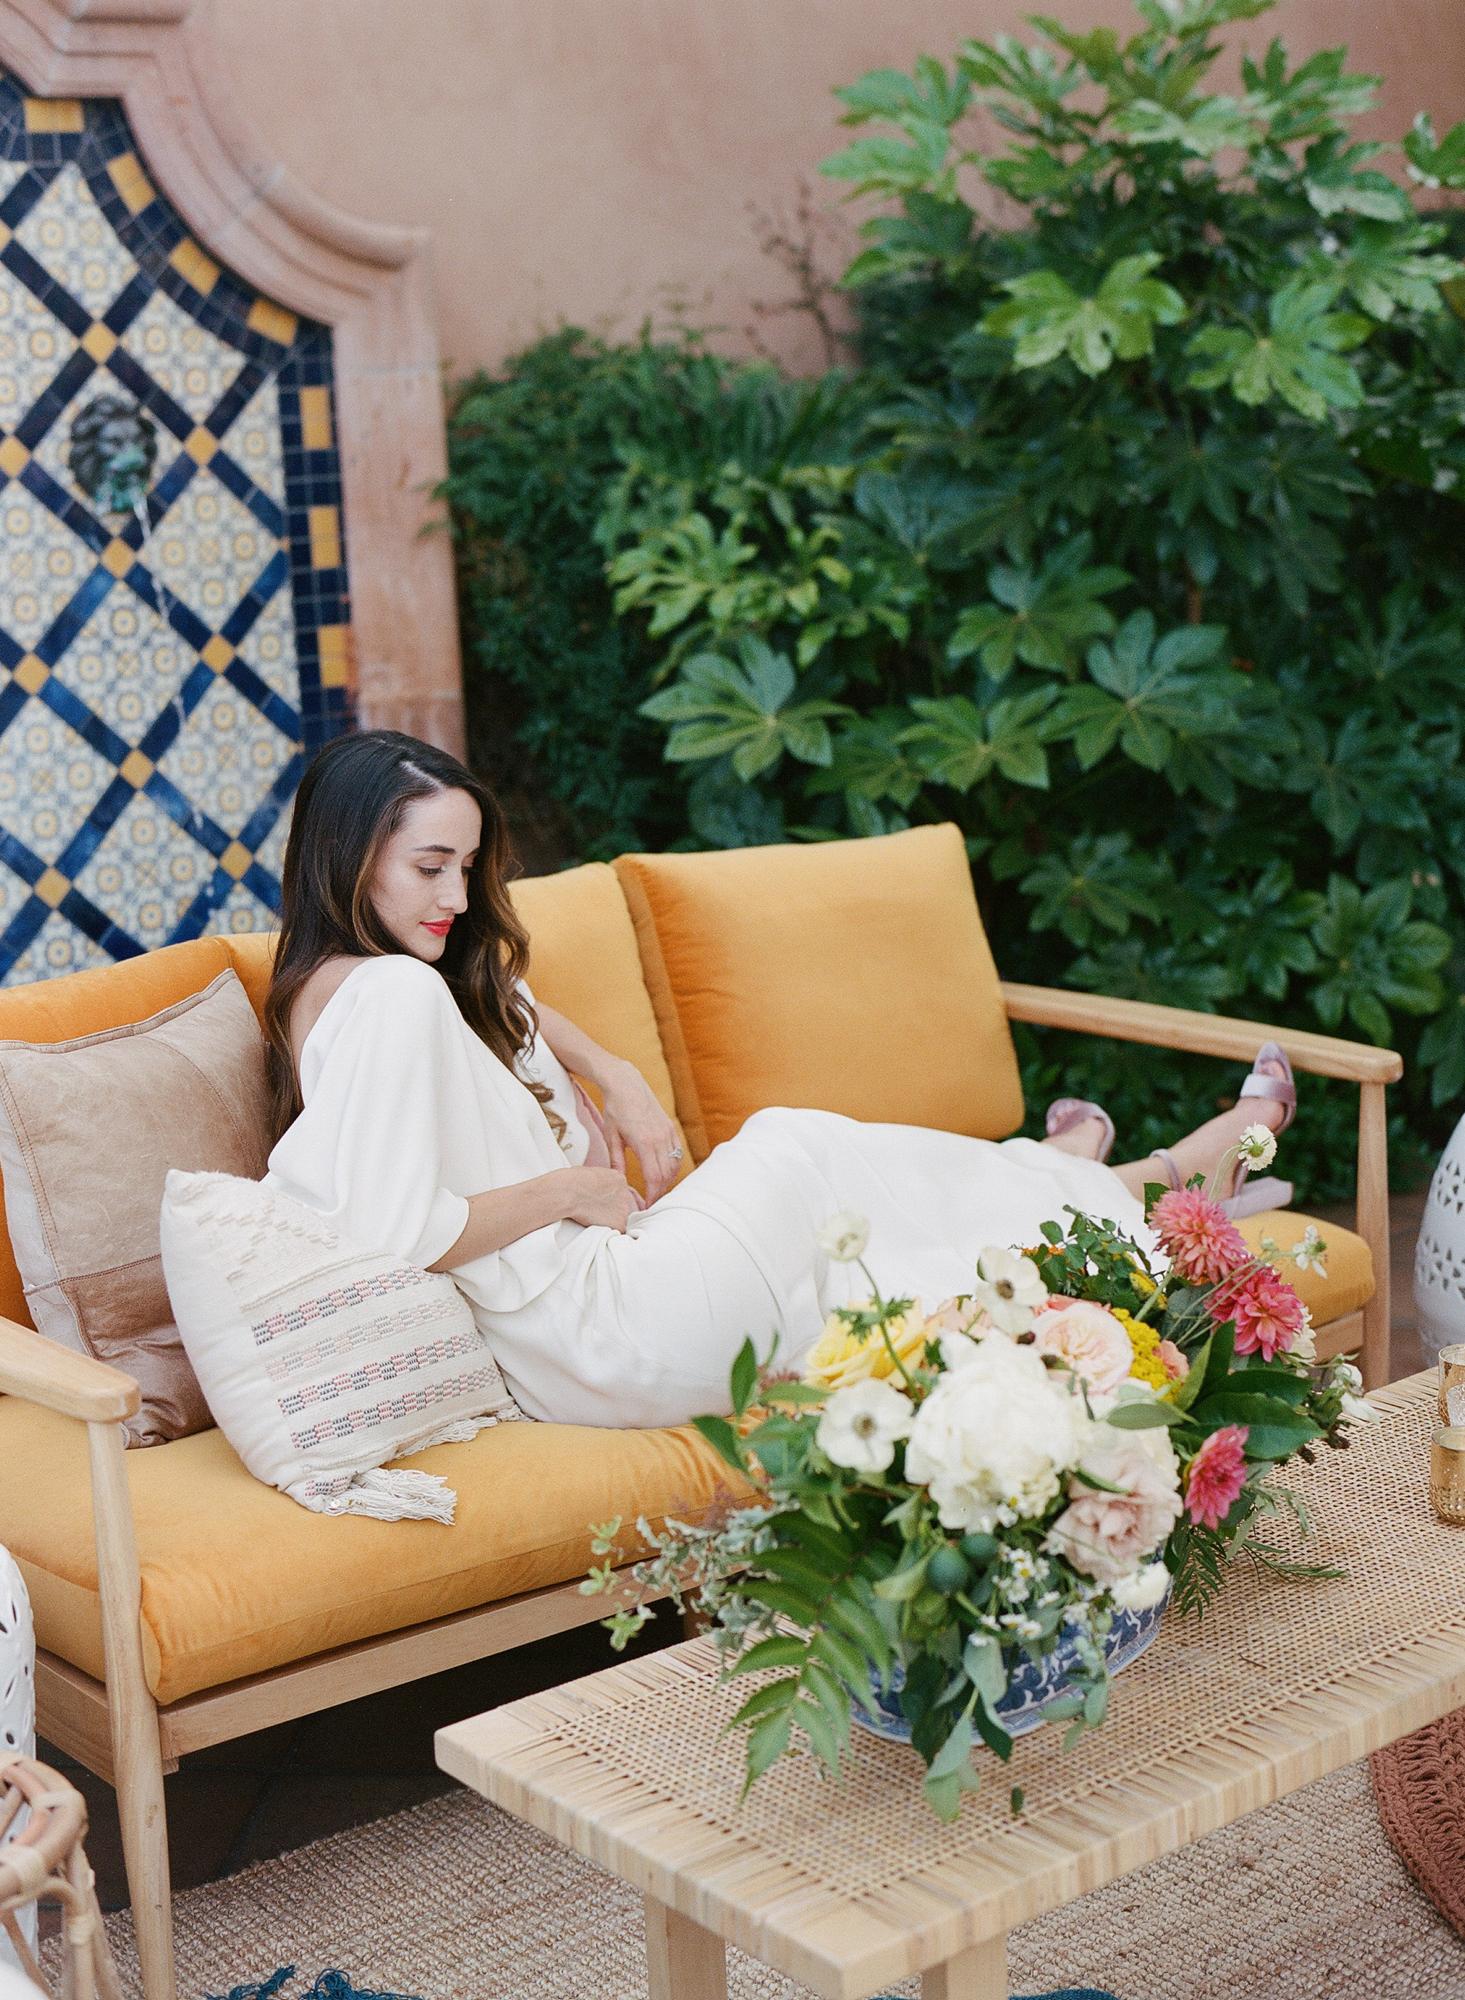 Rancho-Valencia-wedding-blooms-by-breesa-lee-rochelle-cheever-francine-ribeau-luxury-garden-rancho-santa-fe-hey-there-cupcake-adore-folklore-387.JPG